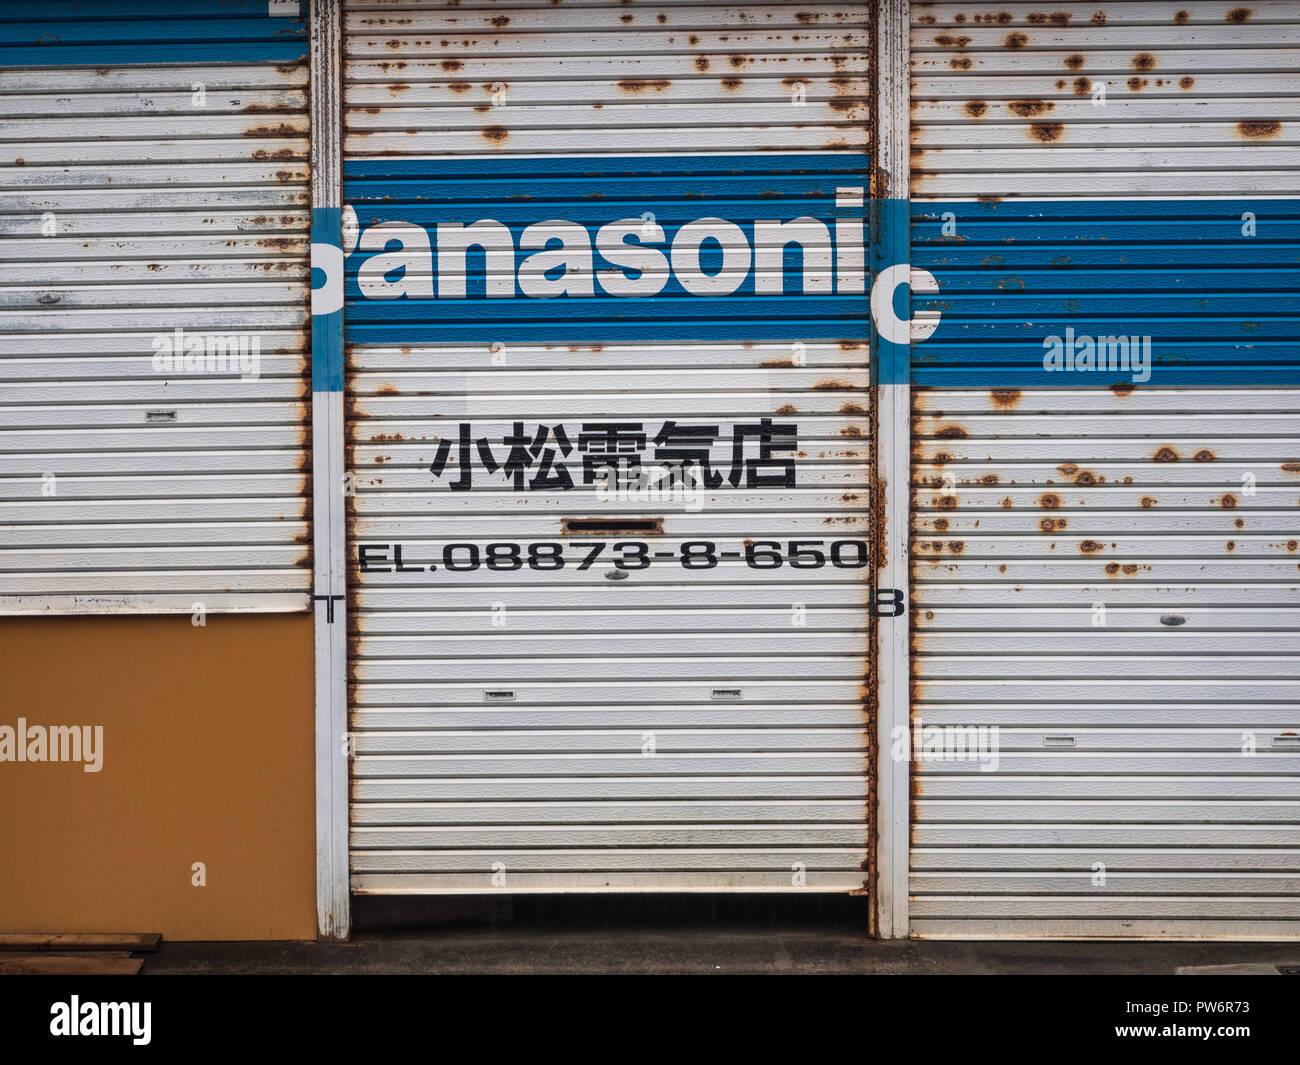 Out-of-alignment, Panasonic roller doors, Tano, Kochi, Shikoku, Japan - Stock Image